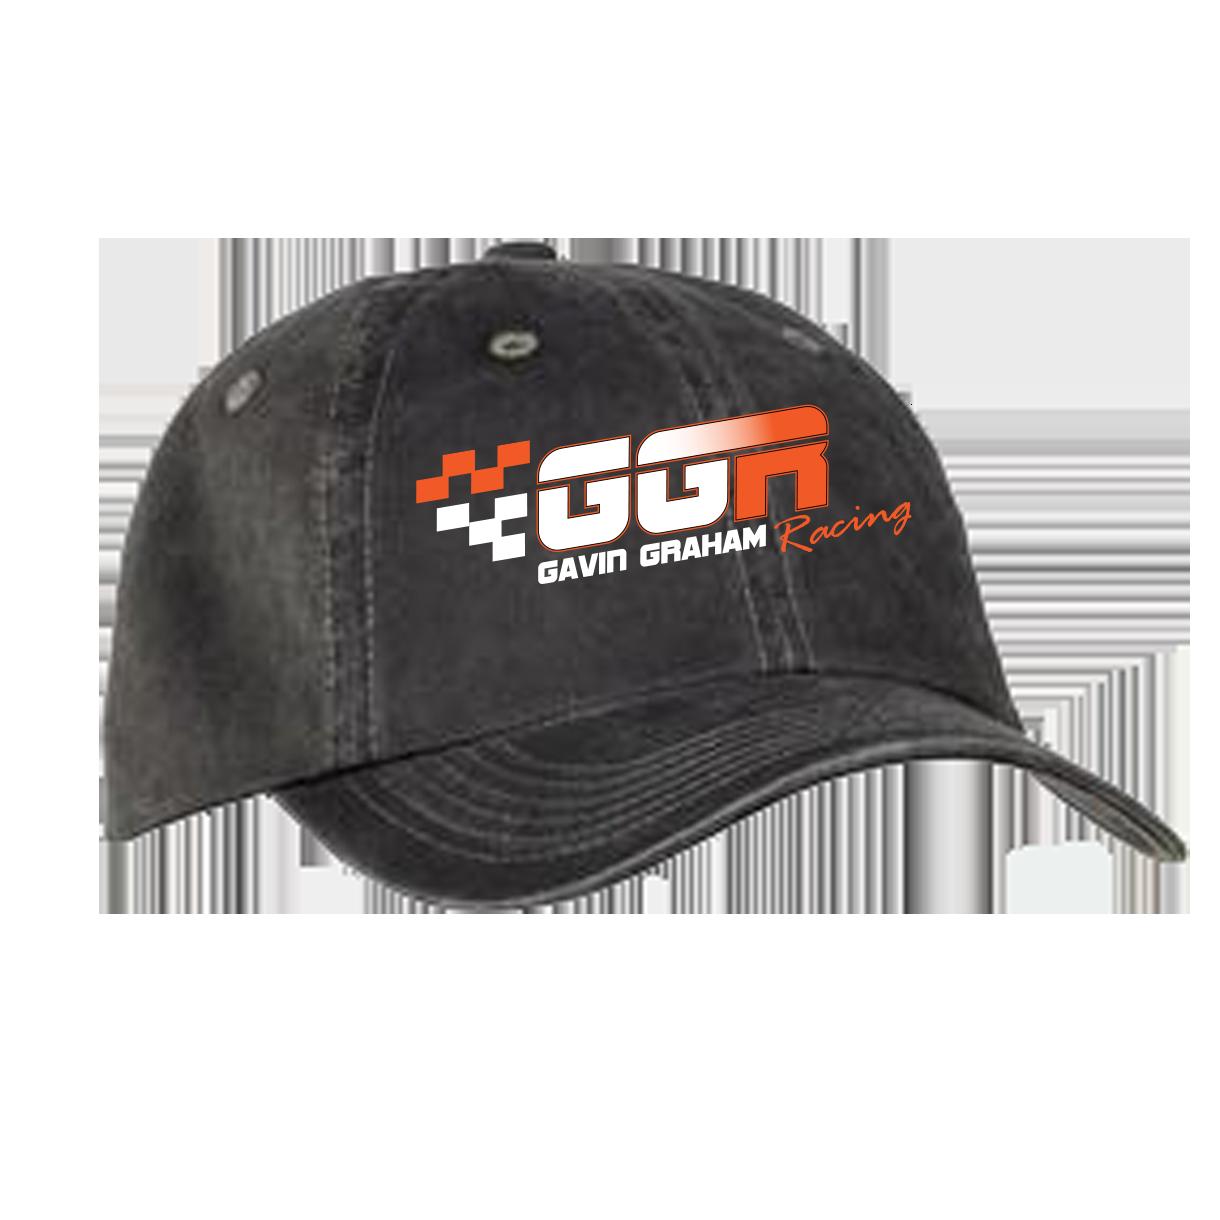 Gavin Graham Adjustable Hat